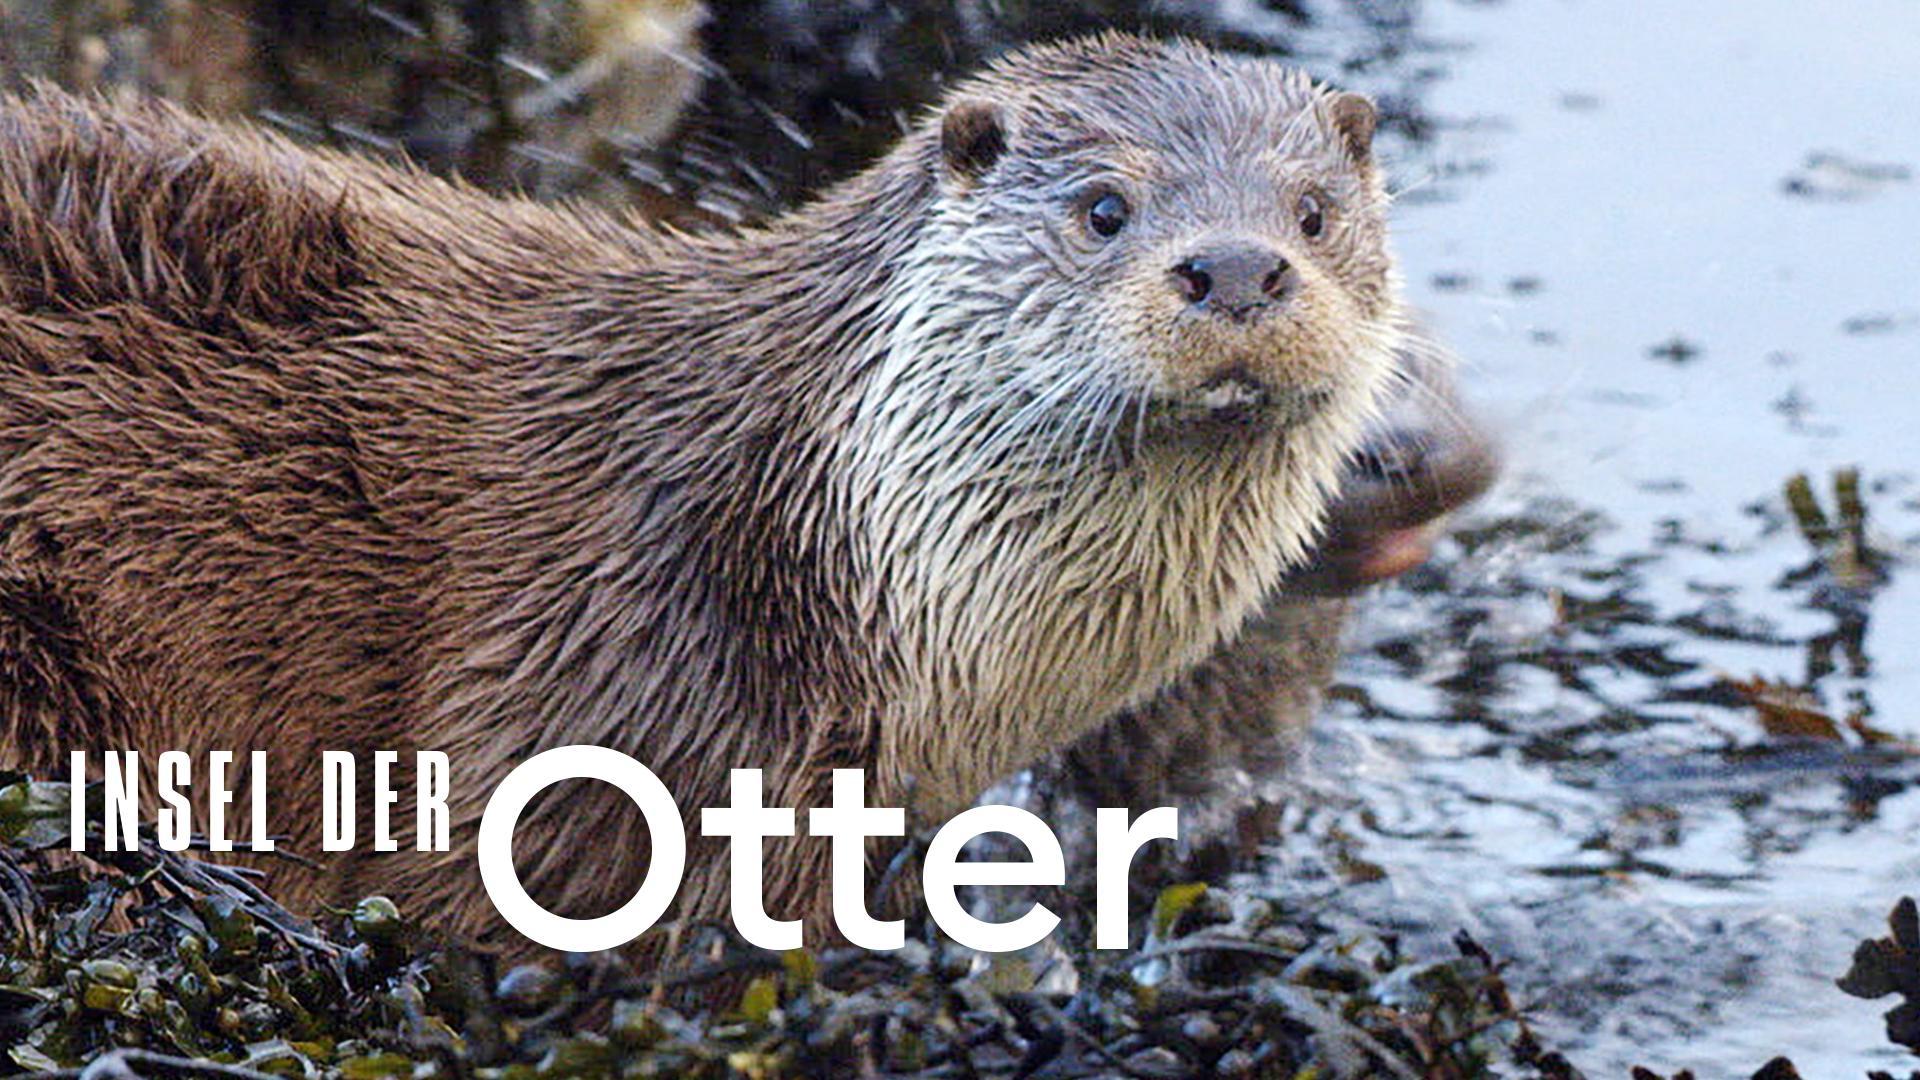 Insel der Otter